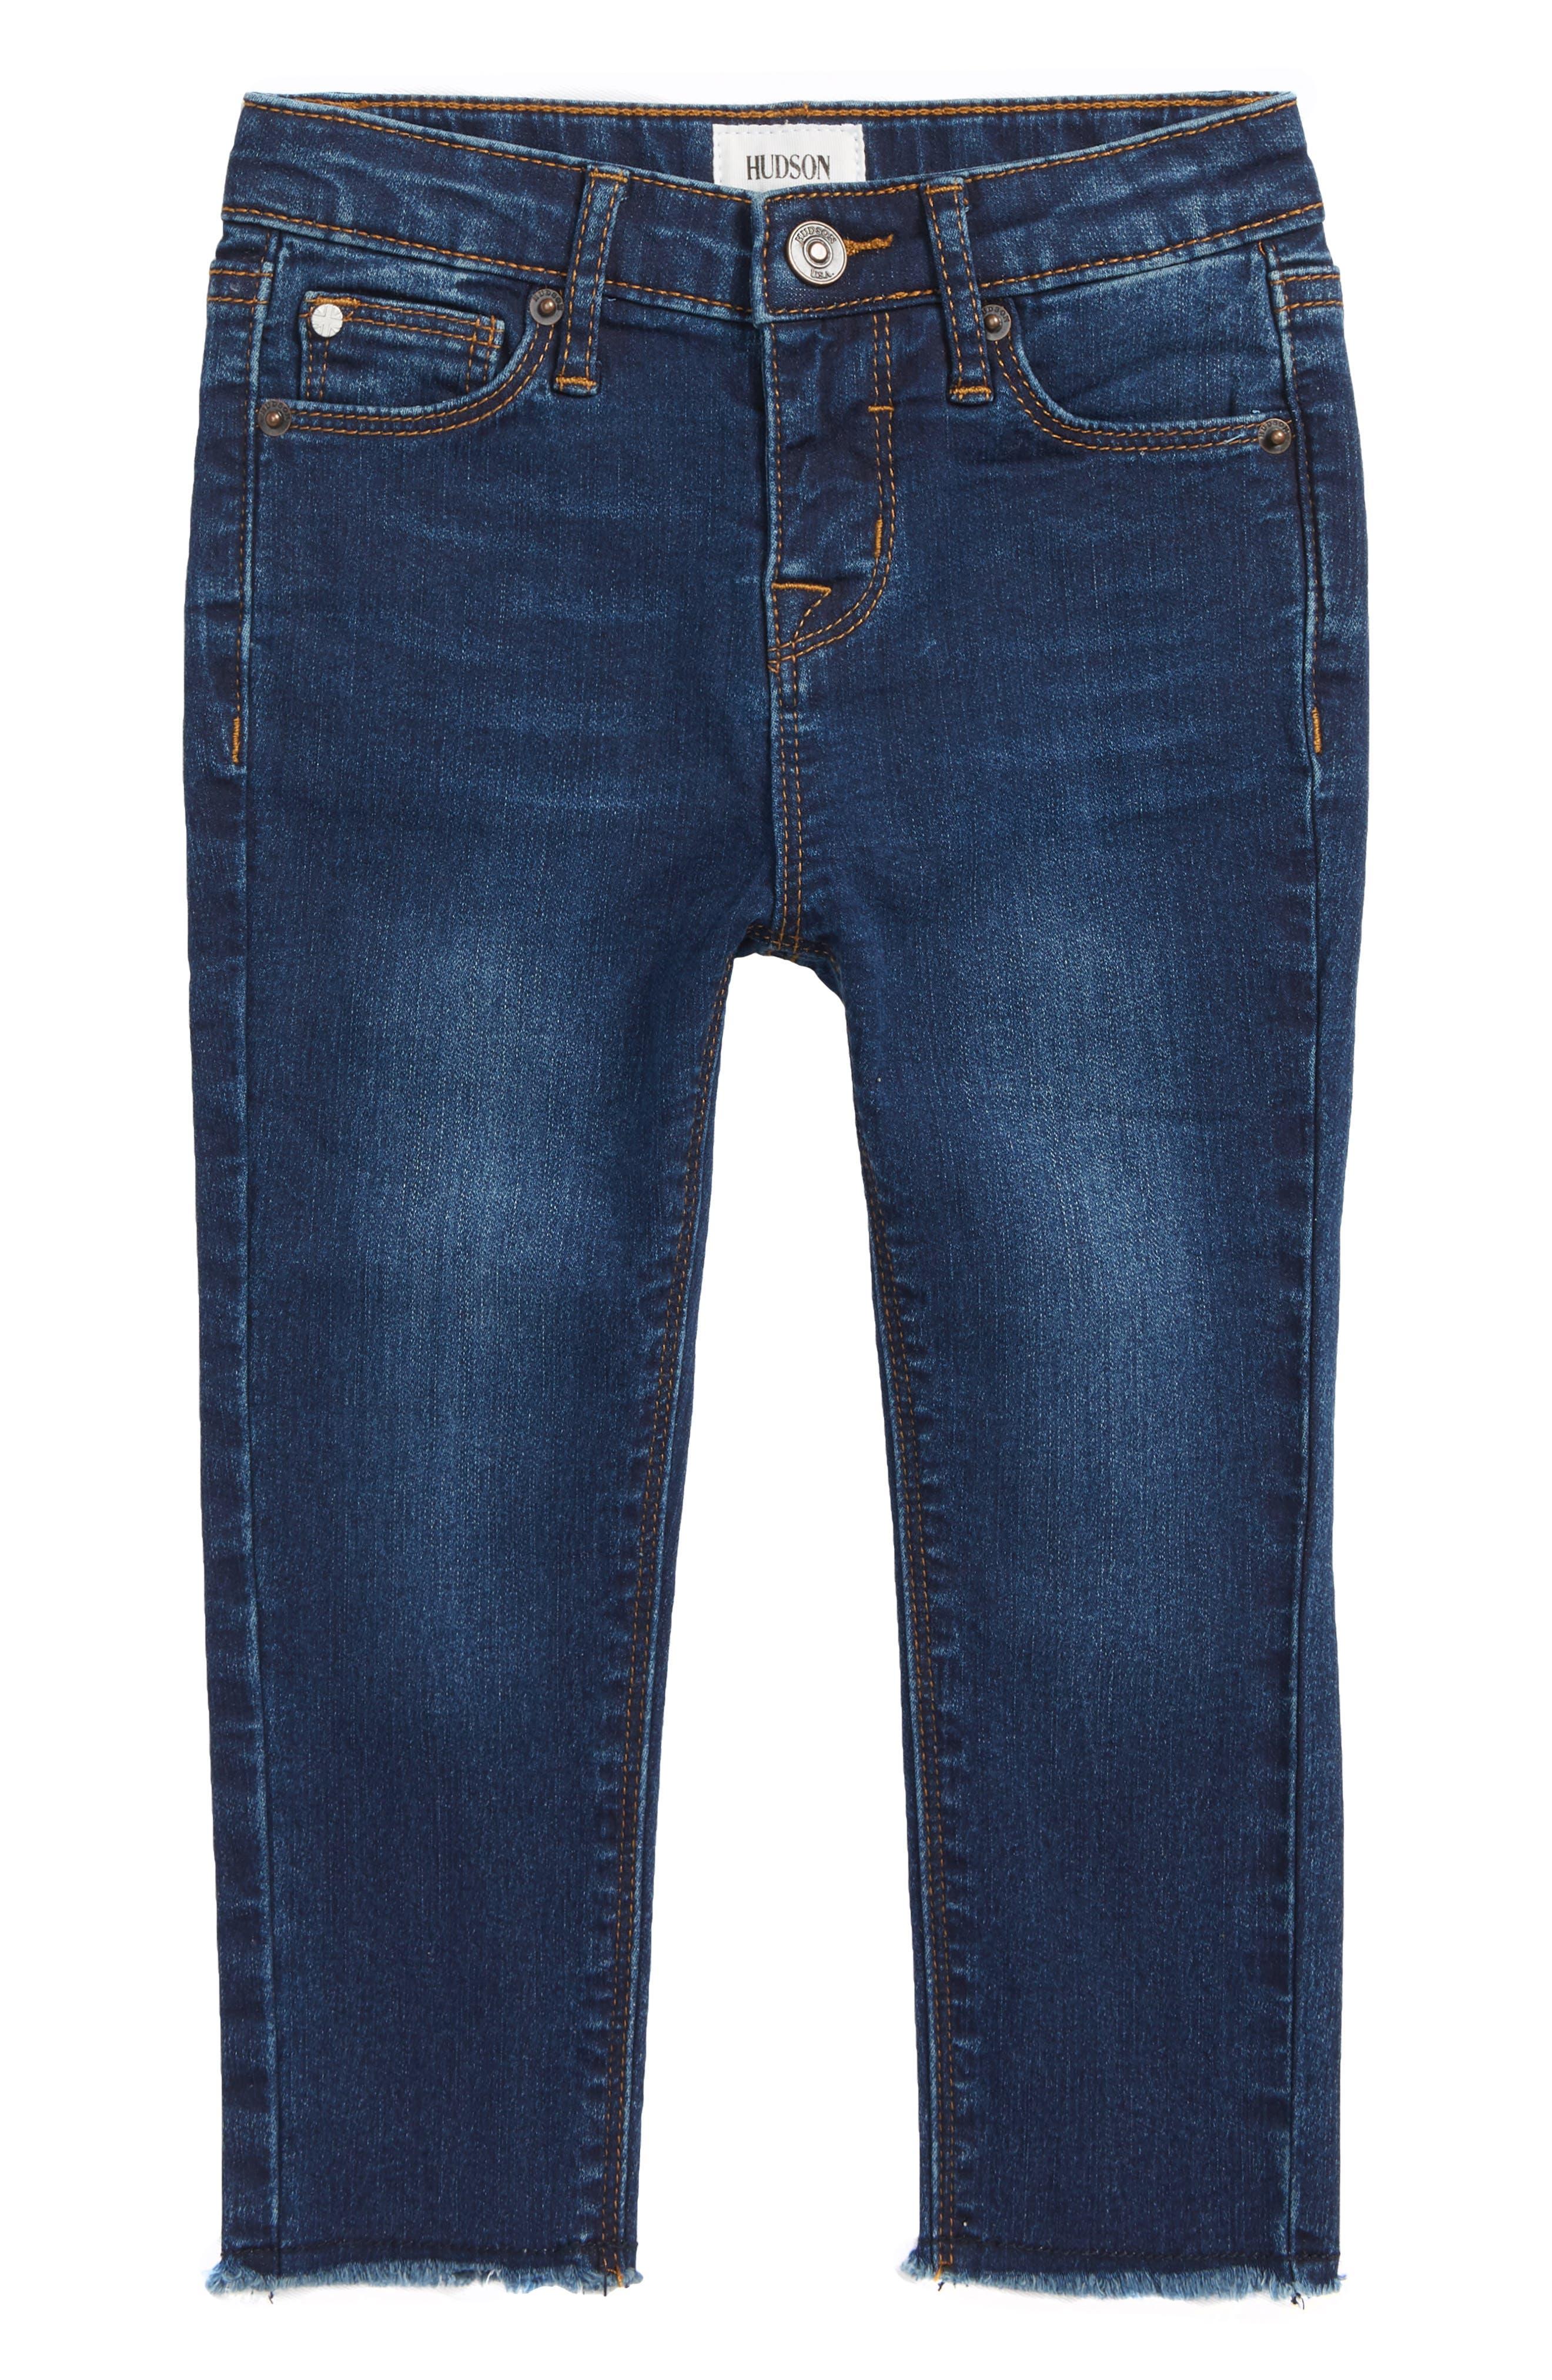 Calin Pull-On Skinny Jeans,                         Main,                         color, BDT-BLUE DEPTHS